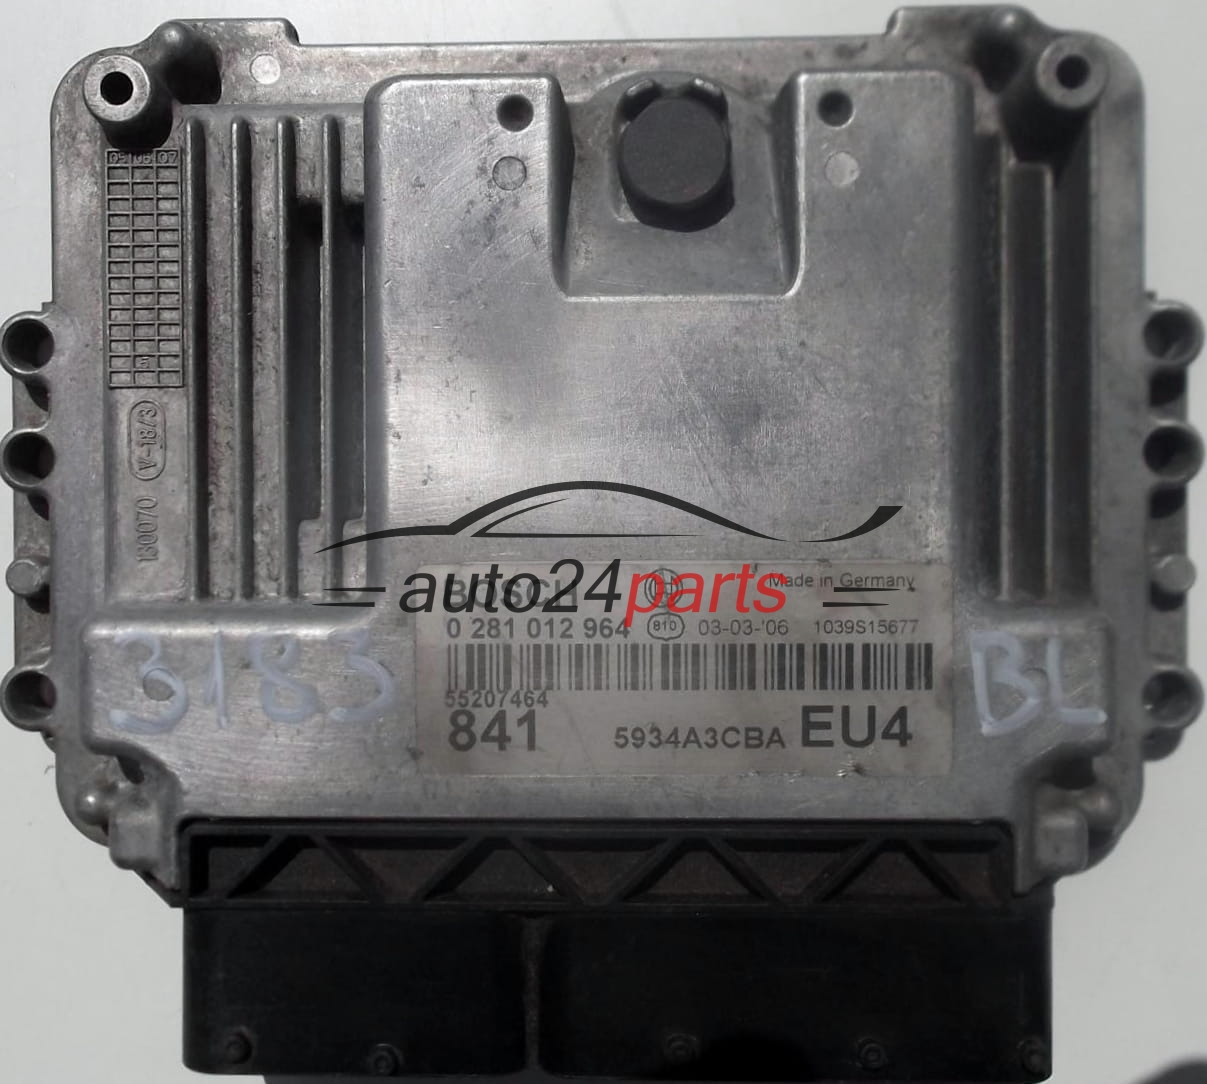 ecu engine controller lancia thesis 2.4 jtd bosch 0281012964, 0 281